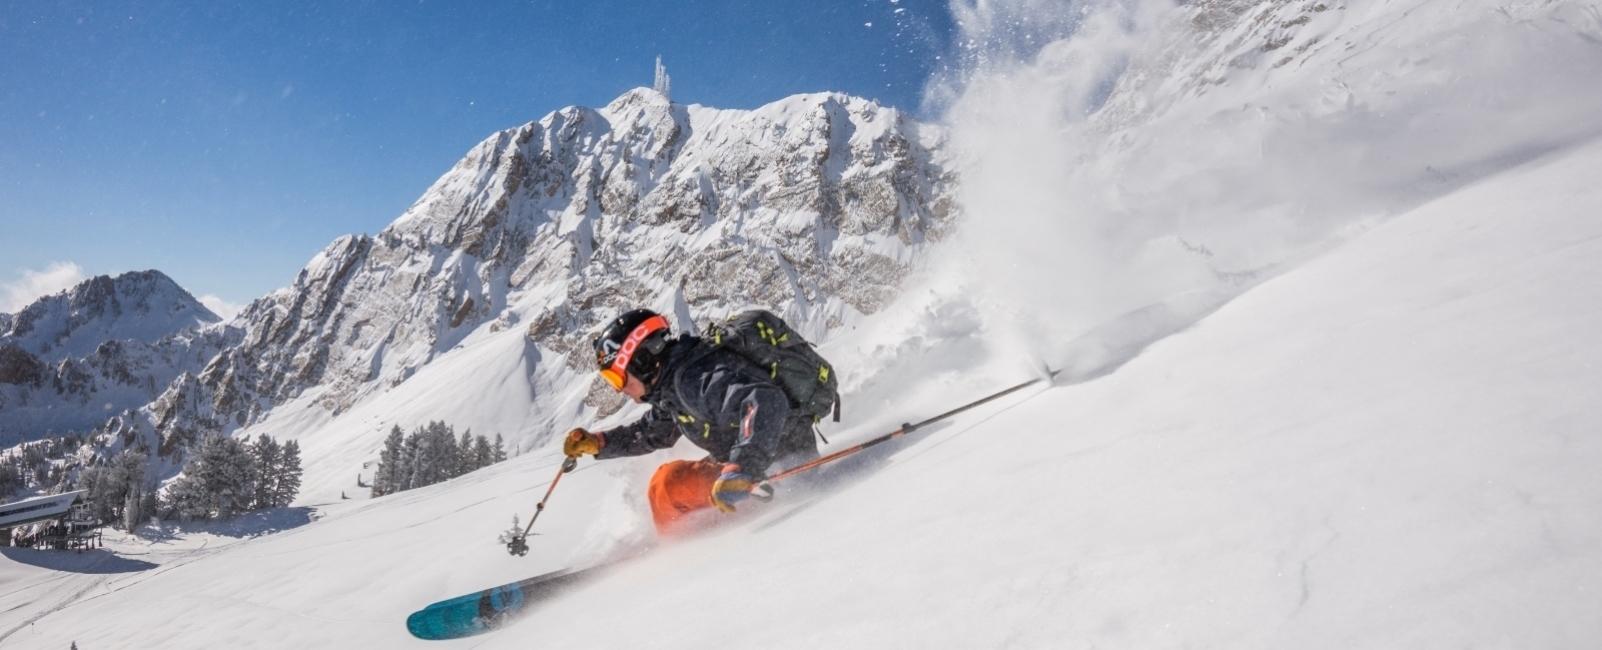 5 Reasons to Choose Snowbasin this Year